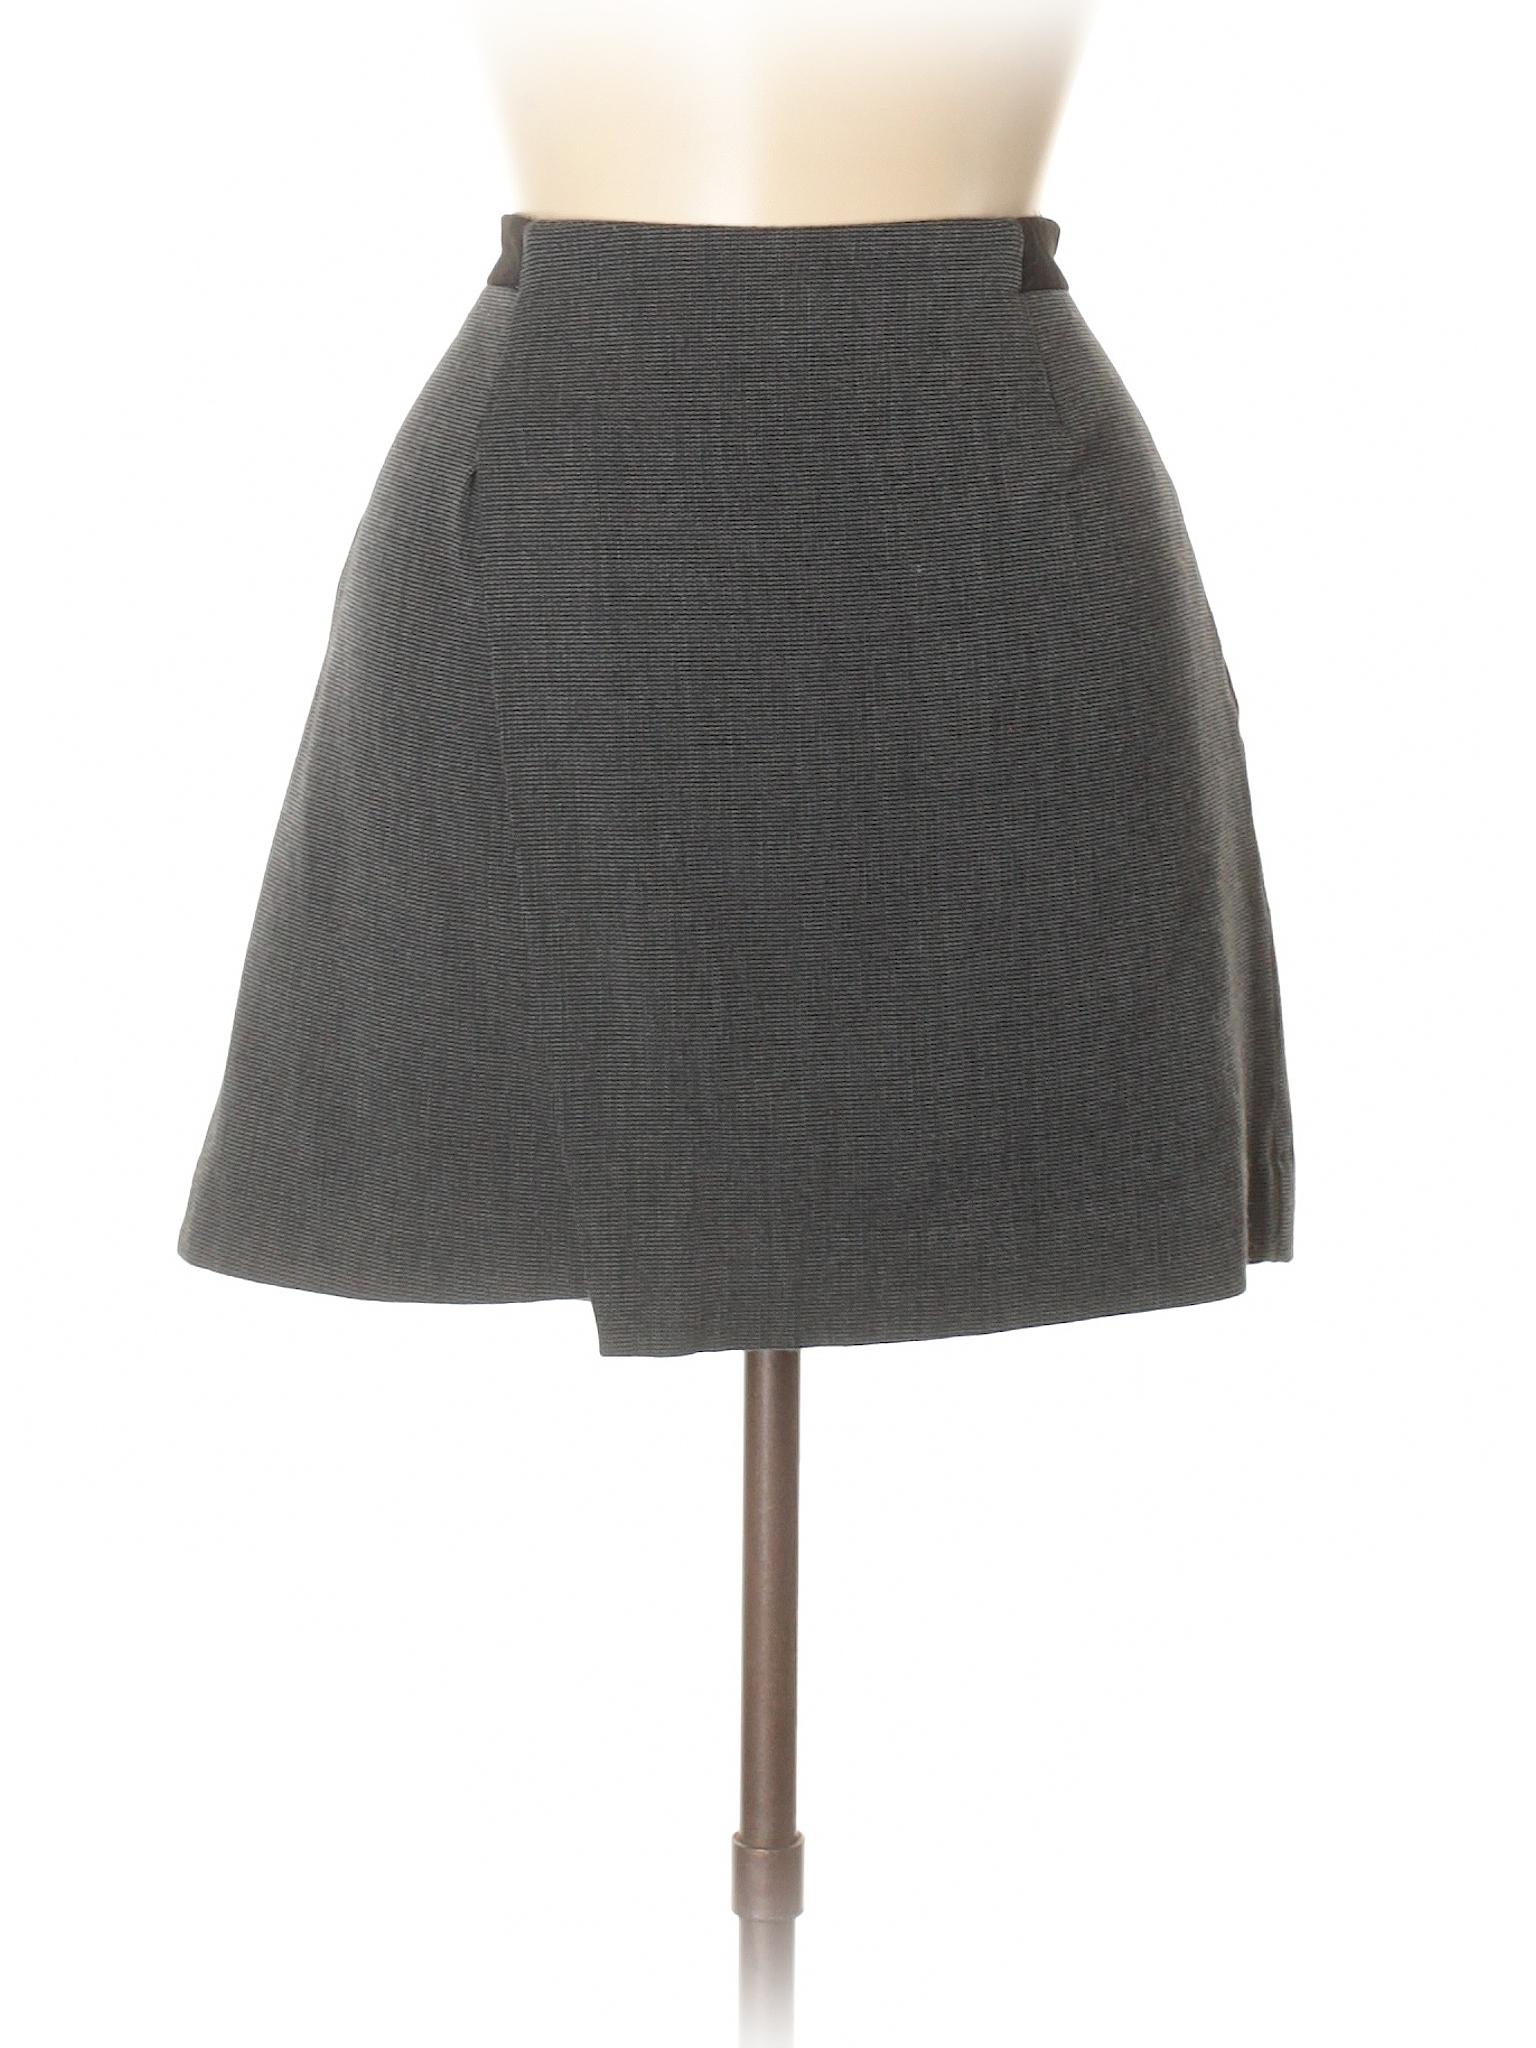 Boutique Casual Boutique Skirt Casual Boutique Casual Skirt Skirt Boutique 4wOIXXxqdv